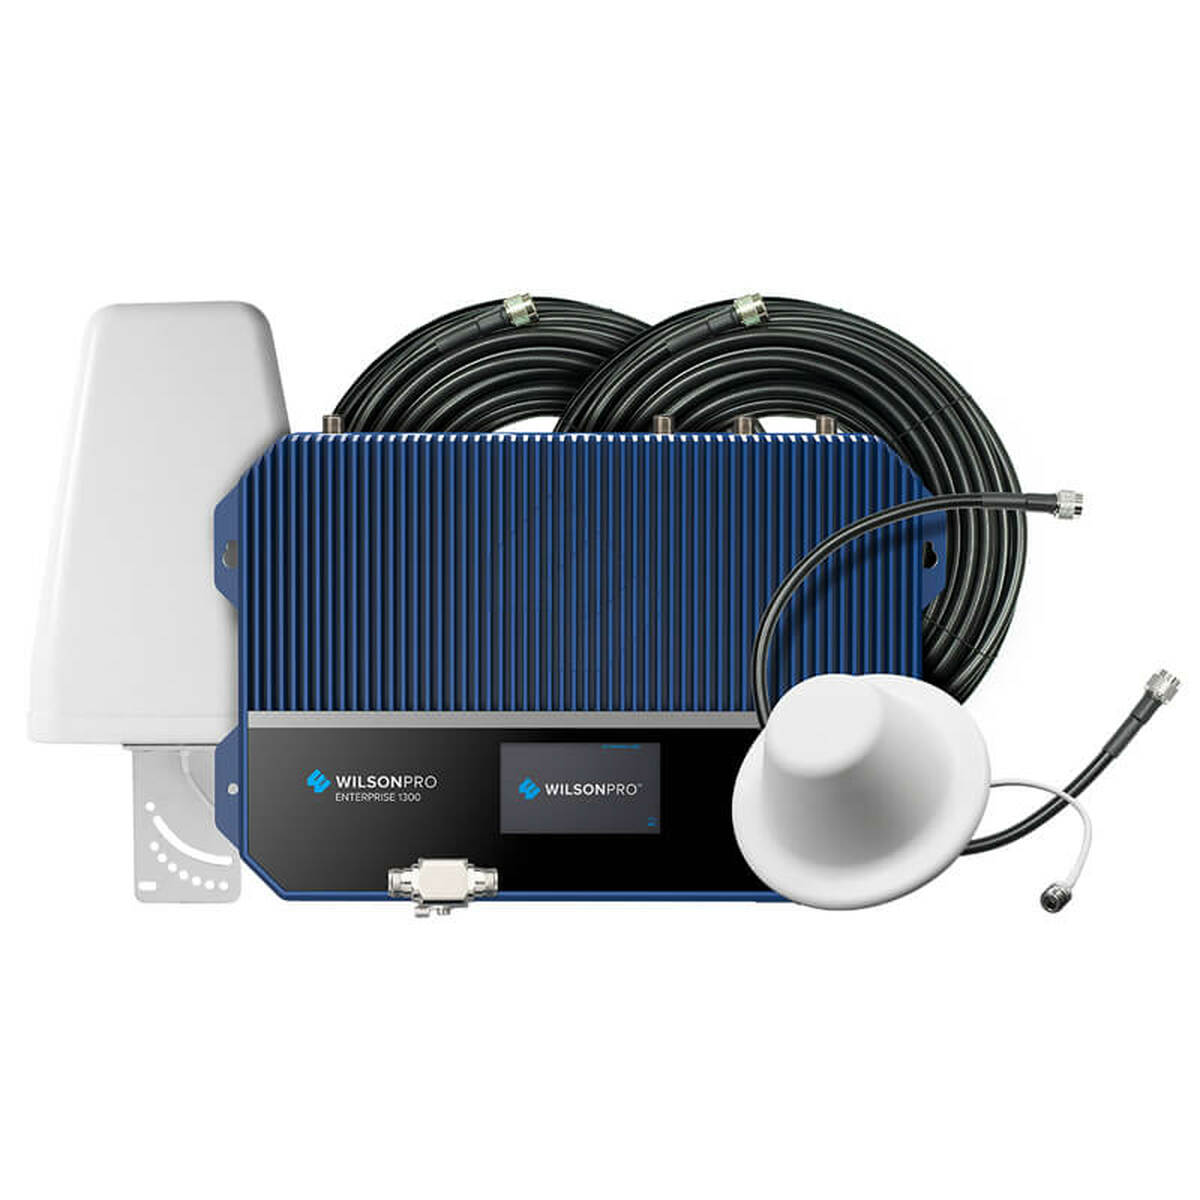 WilsonPro Enterprise 1300 Commercial Signal Booster Kit - 460149